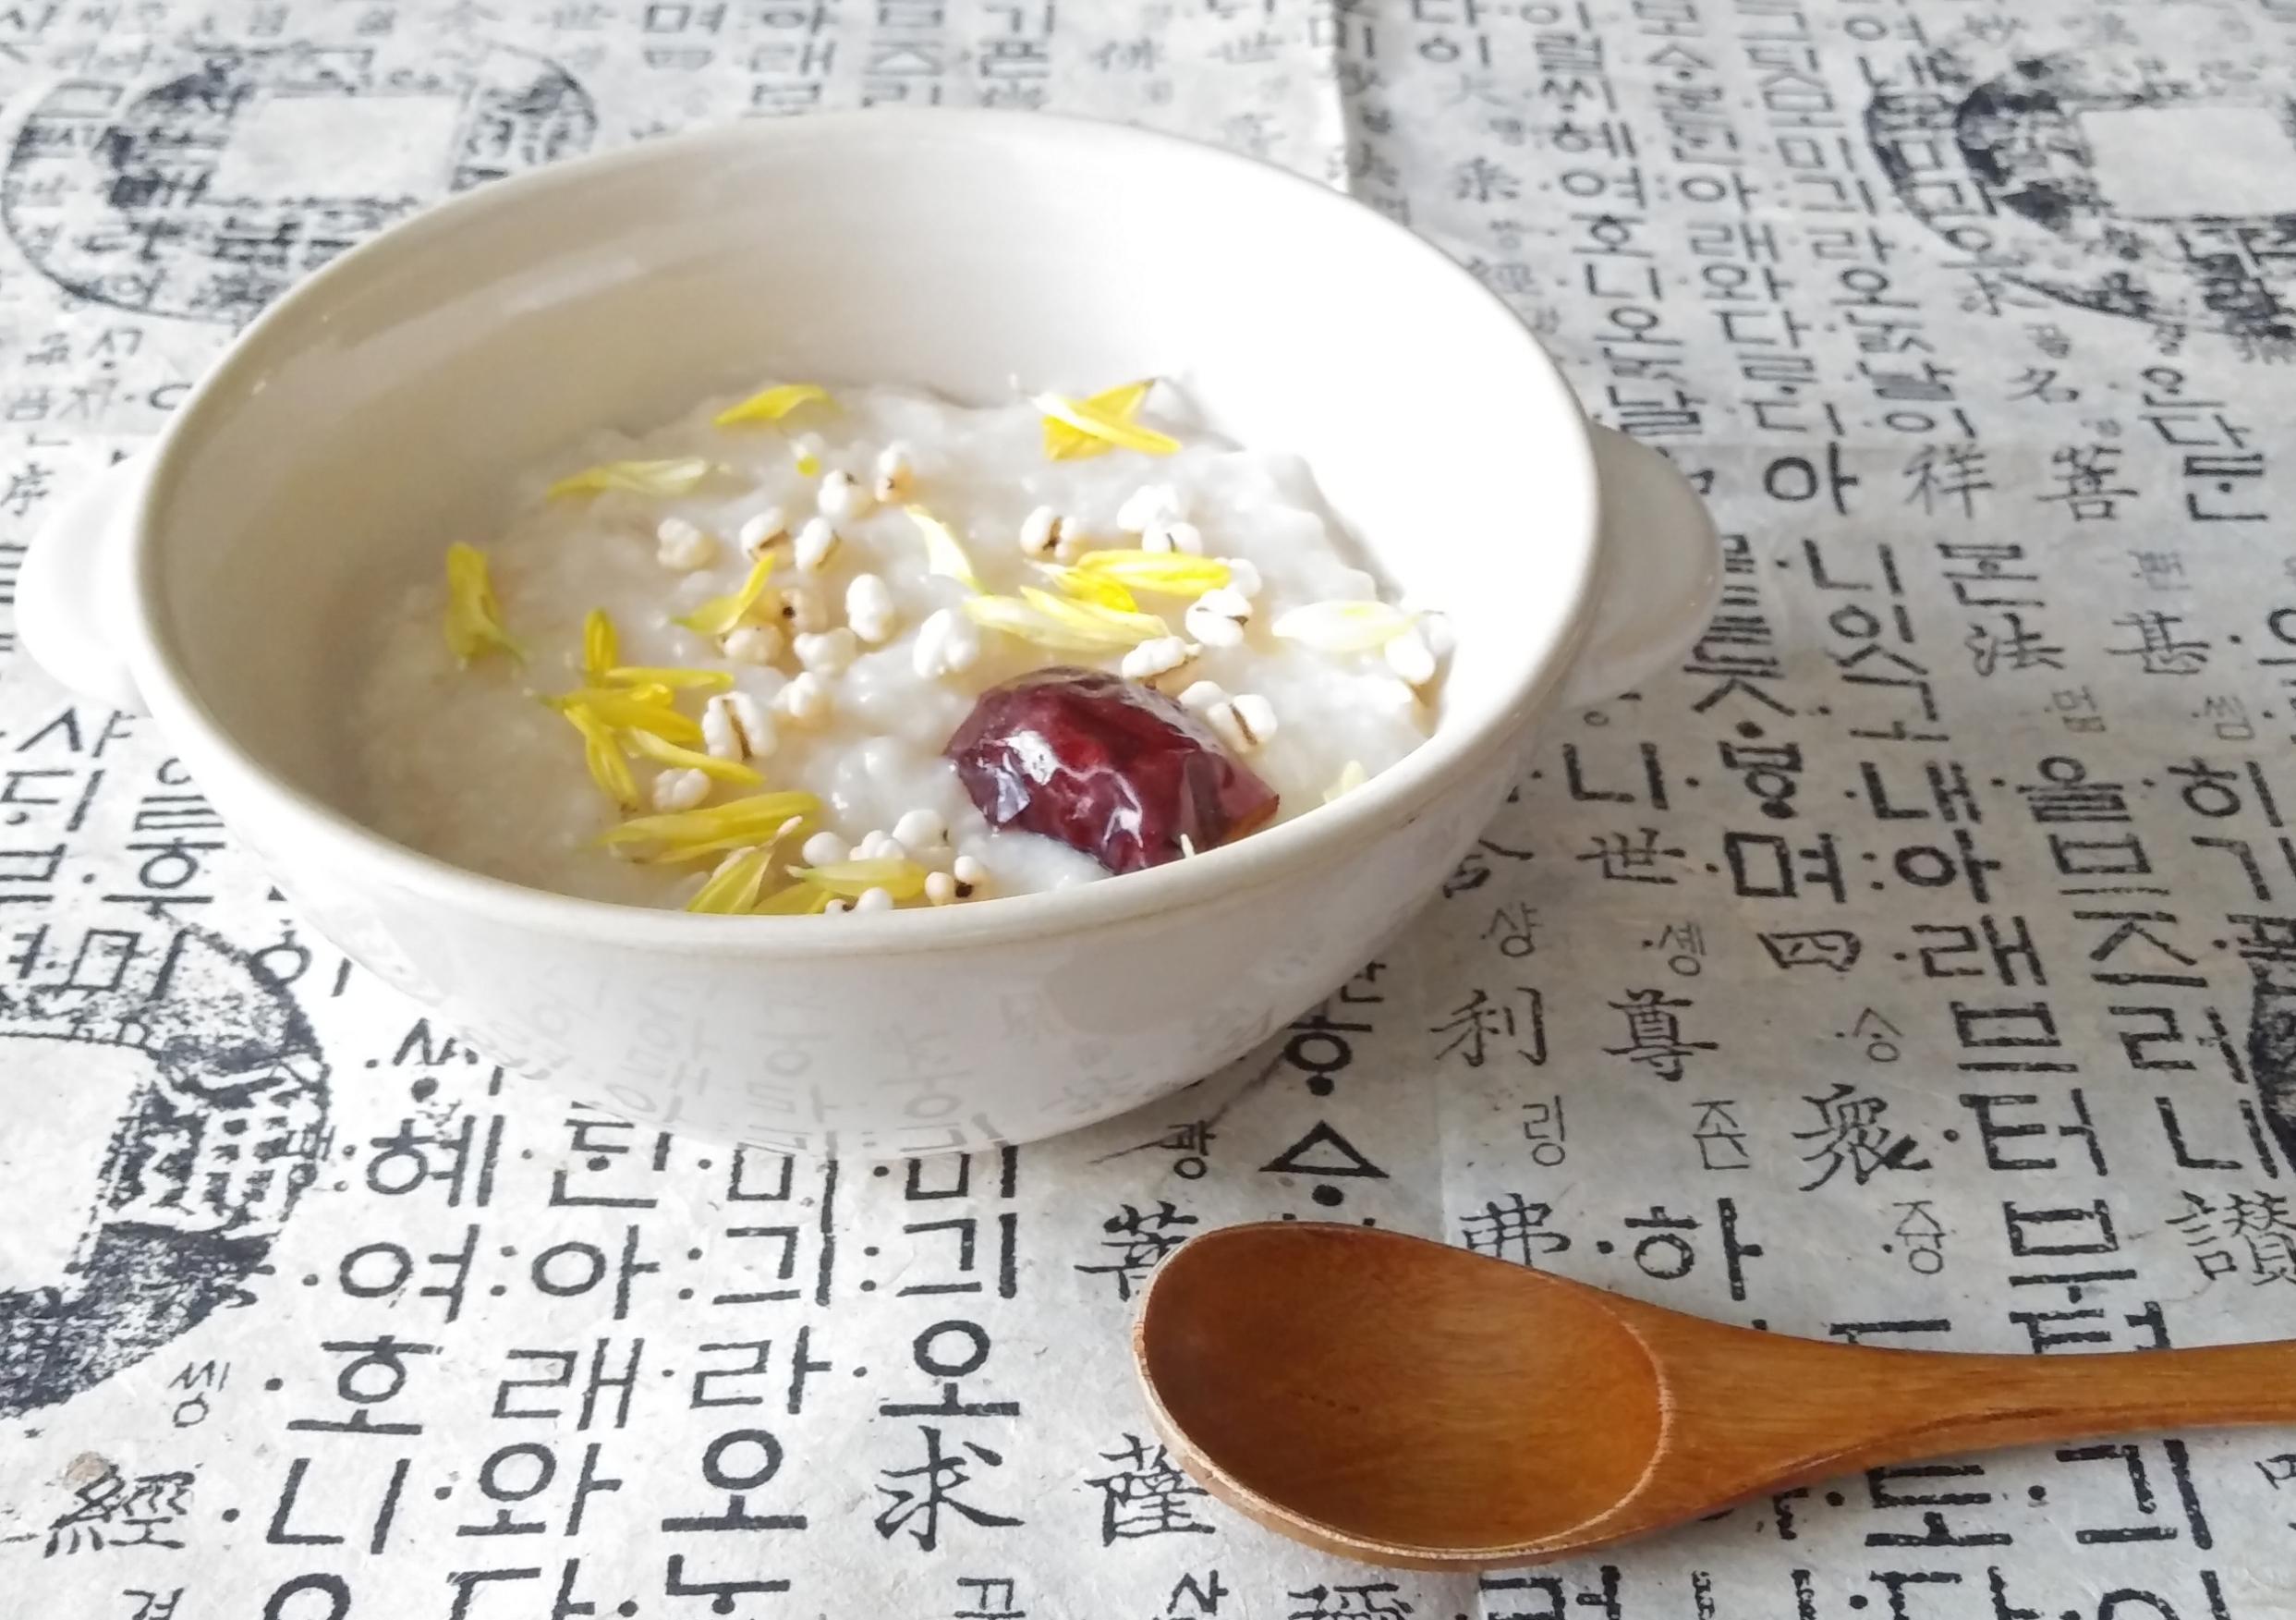 潤い豆乳美容粥